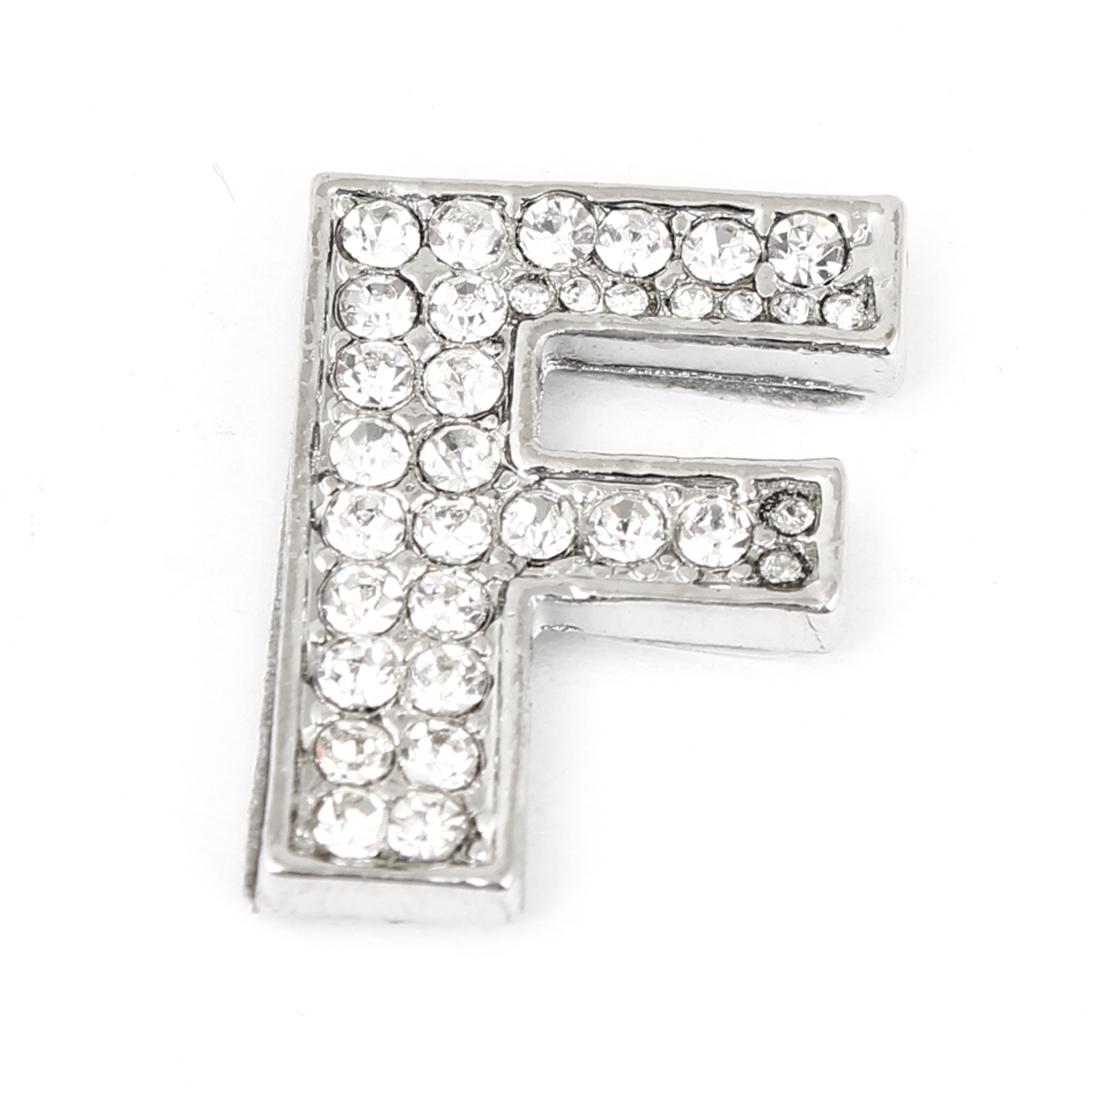 Car Vehicle Rhinestones Accent Silver Tone Letter F Style Sticker Ornament